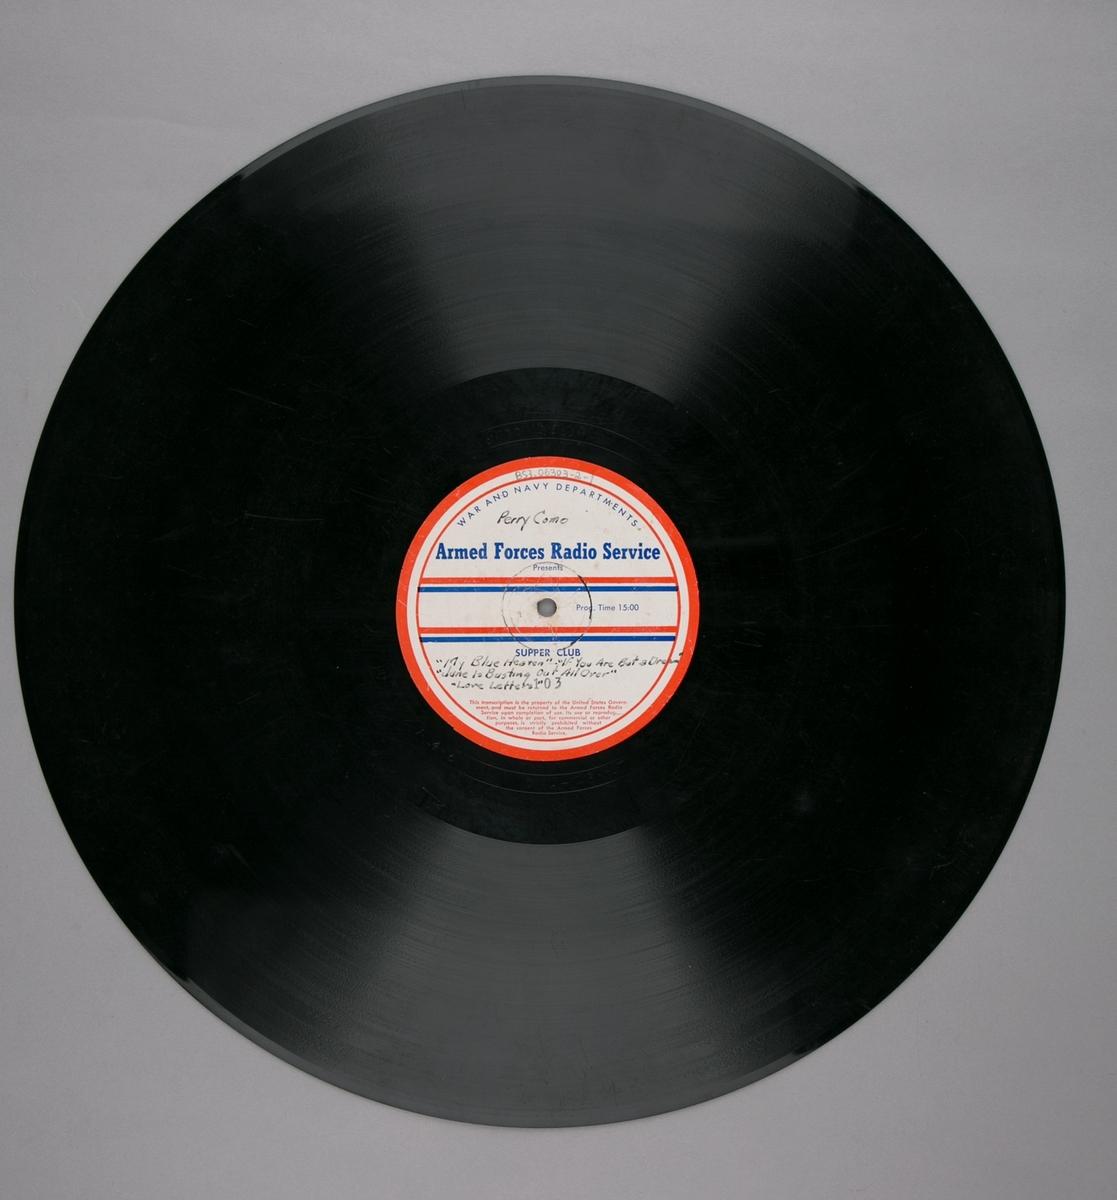 "Grammofonplatesamling. LP-plate med tittel ""Armed Forces Radio Service"" utgitt av War and Navy Departements. Plate i svart vinyl spilles på platespiller med 33 1/3 omdreininger i minuttet (33-plate). I plateomslag."